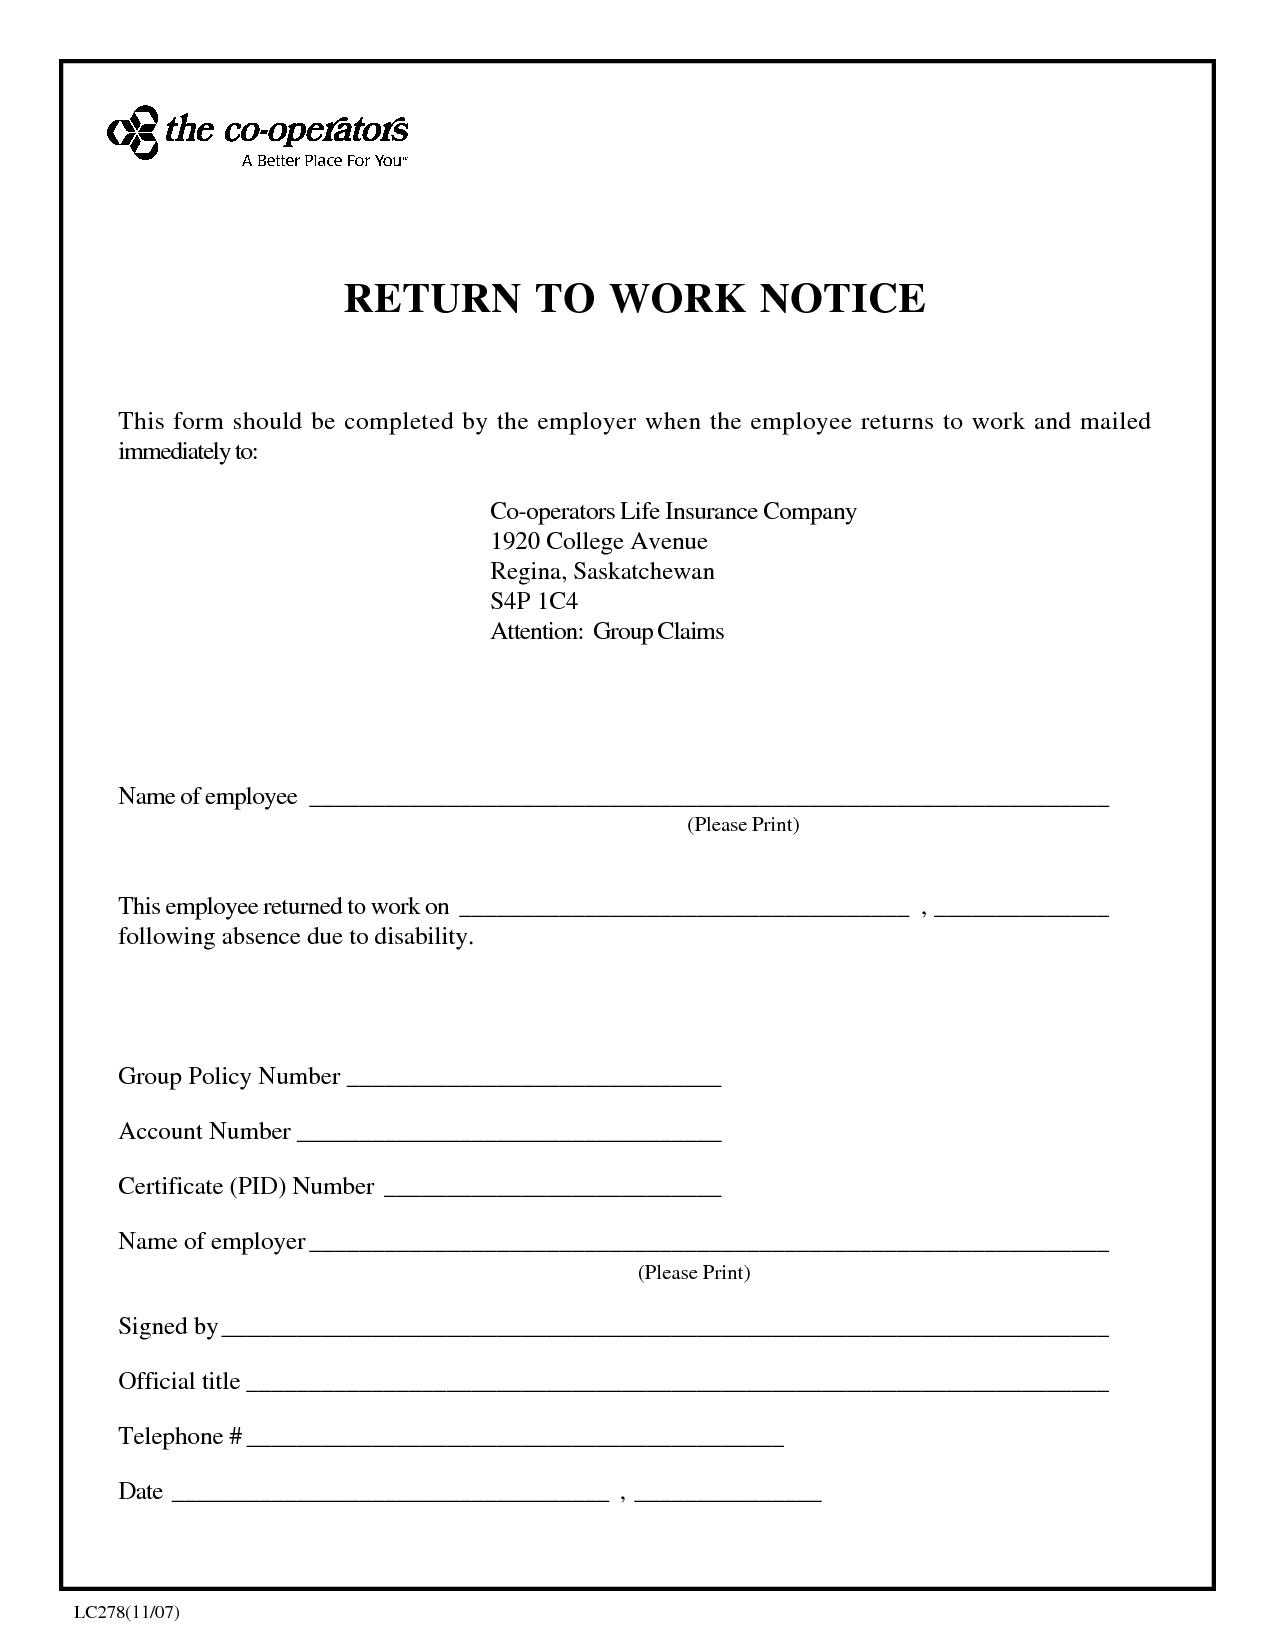 Return To Work Slip Template - Tutlin.psstech.co - Free Printable Doctor Excuse Slips